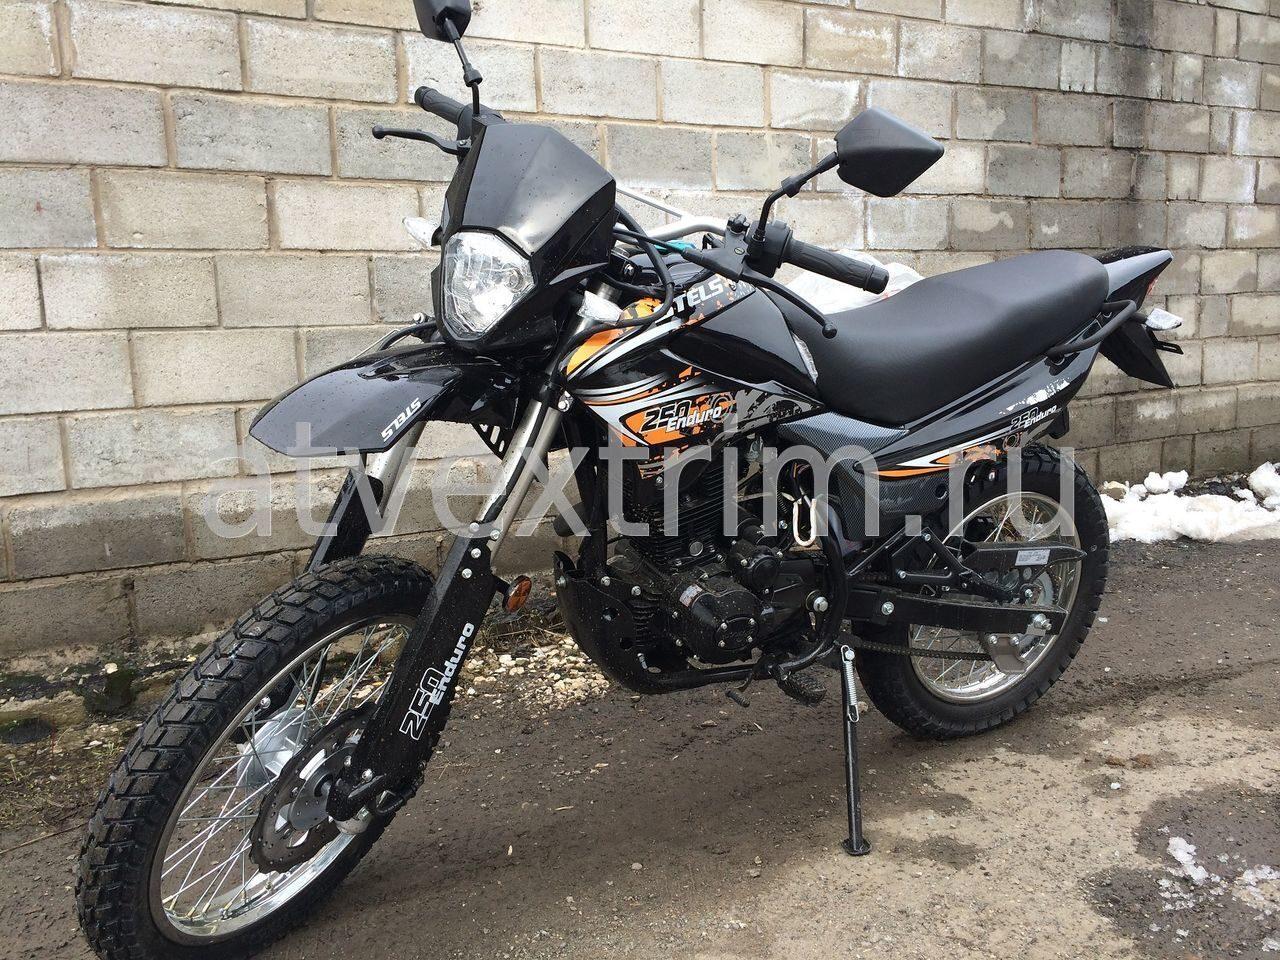 Фото мотоцикла stels 250 эндуро